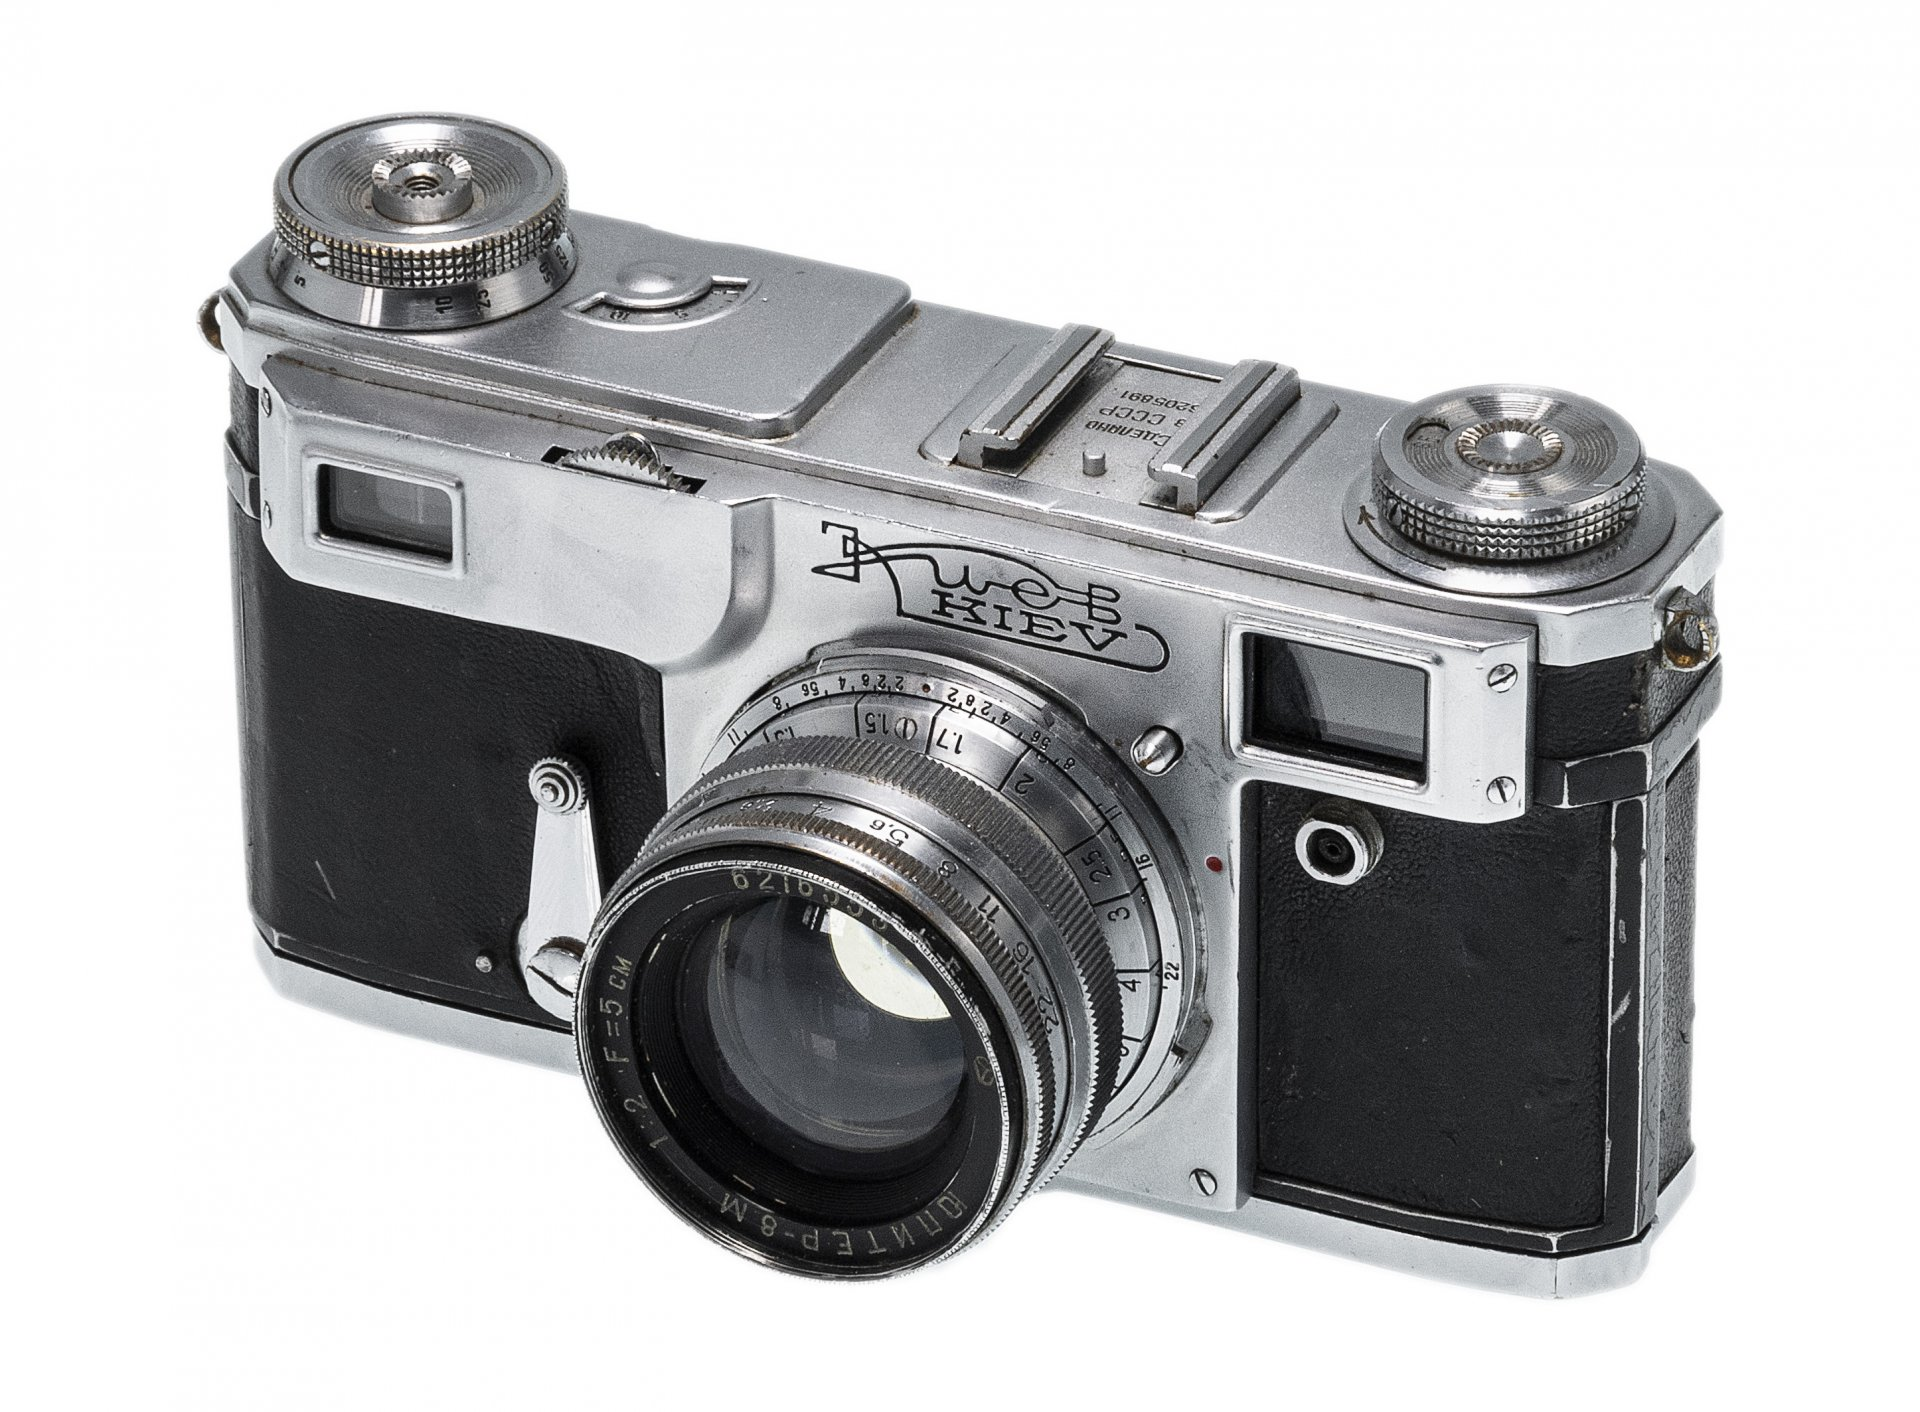 фотоаппарат киев дата выпуска